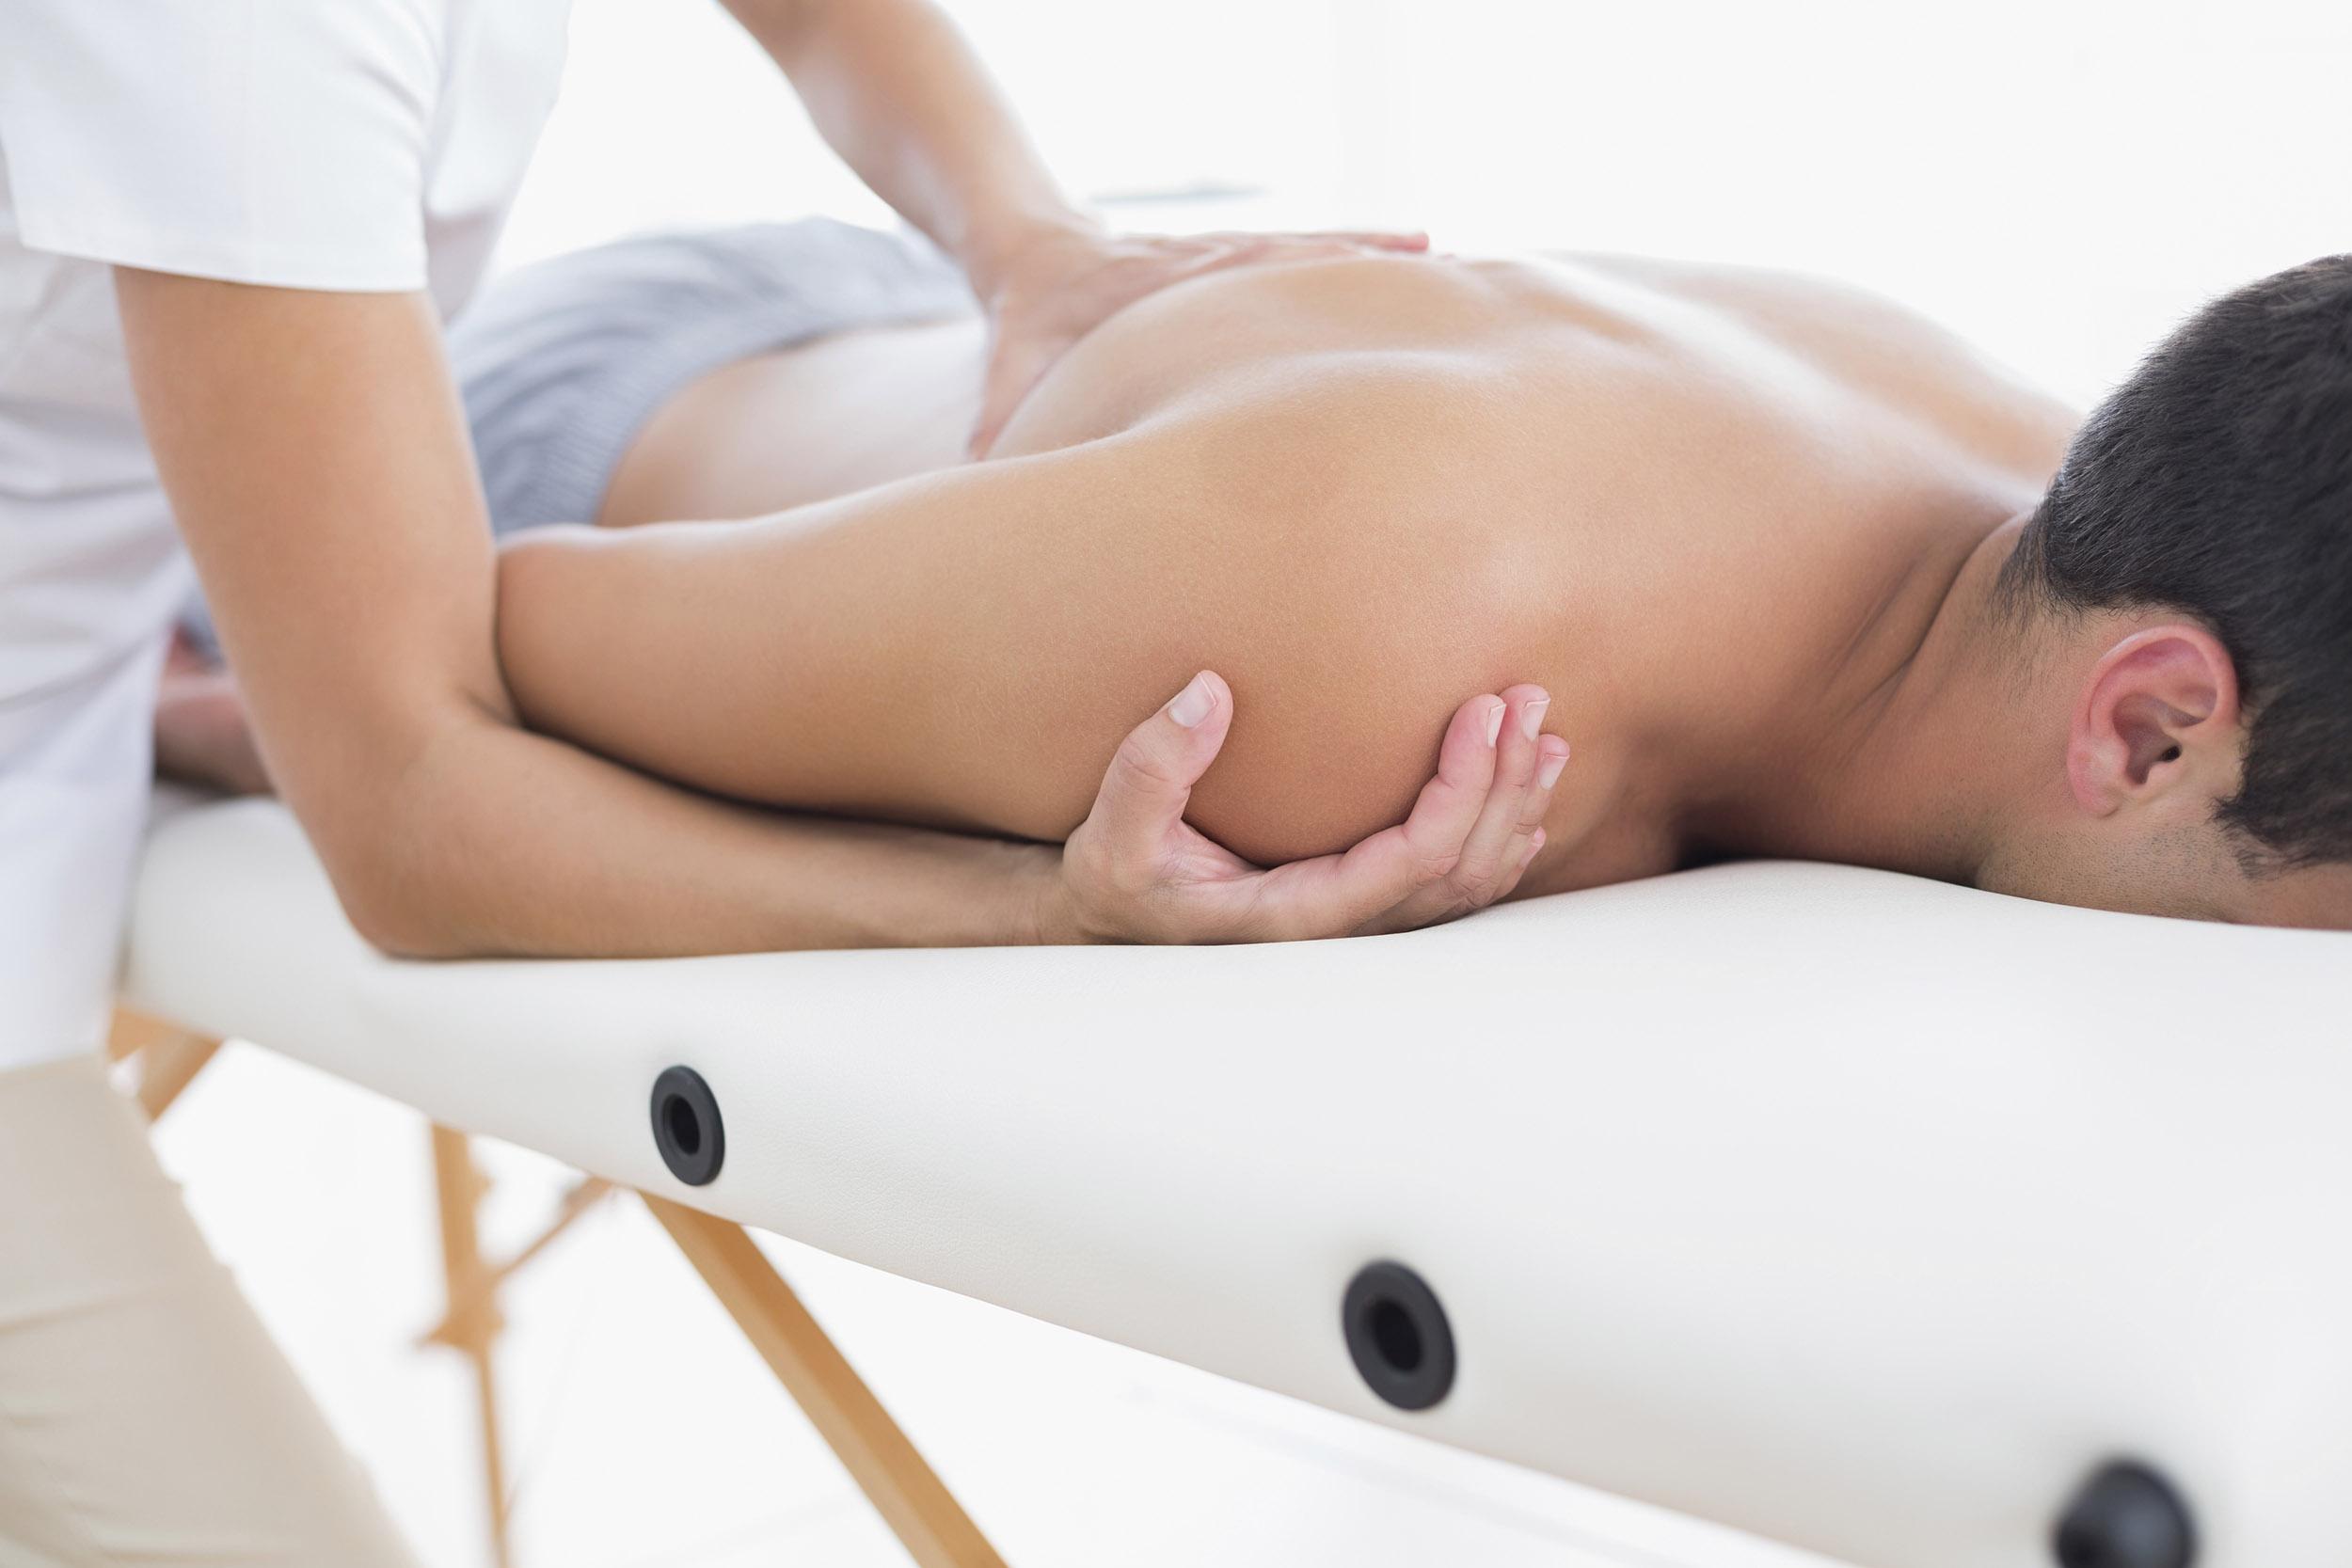 http://proactive-healthcare.com/wp-content/uploads/2015/12/massage.jpg